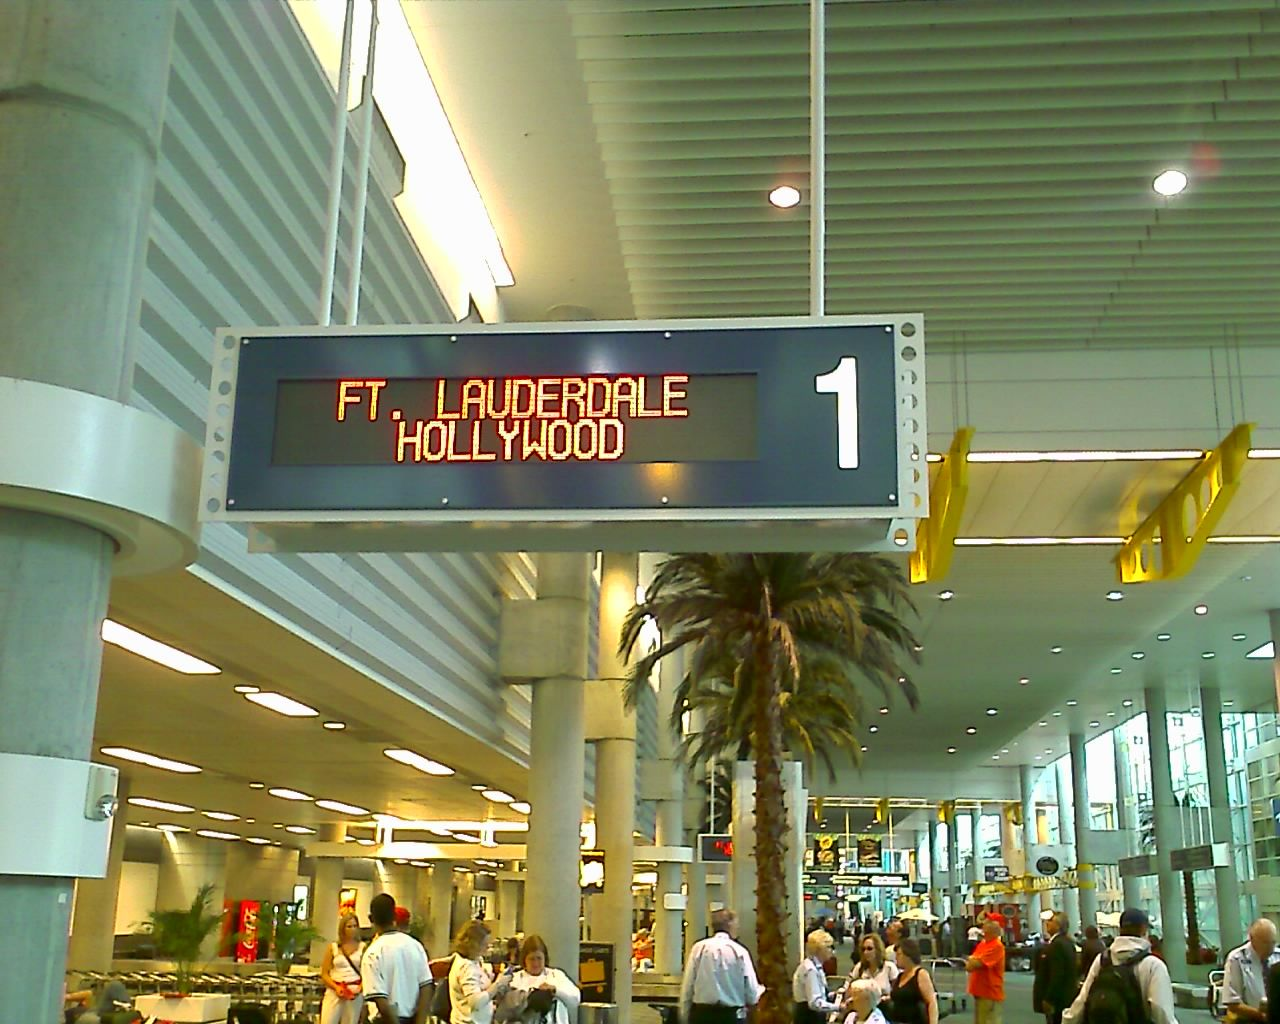 Fort Lauderdale Airport Fort Lauderdale Airport Lauderdale